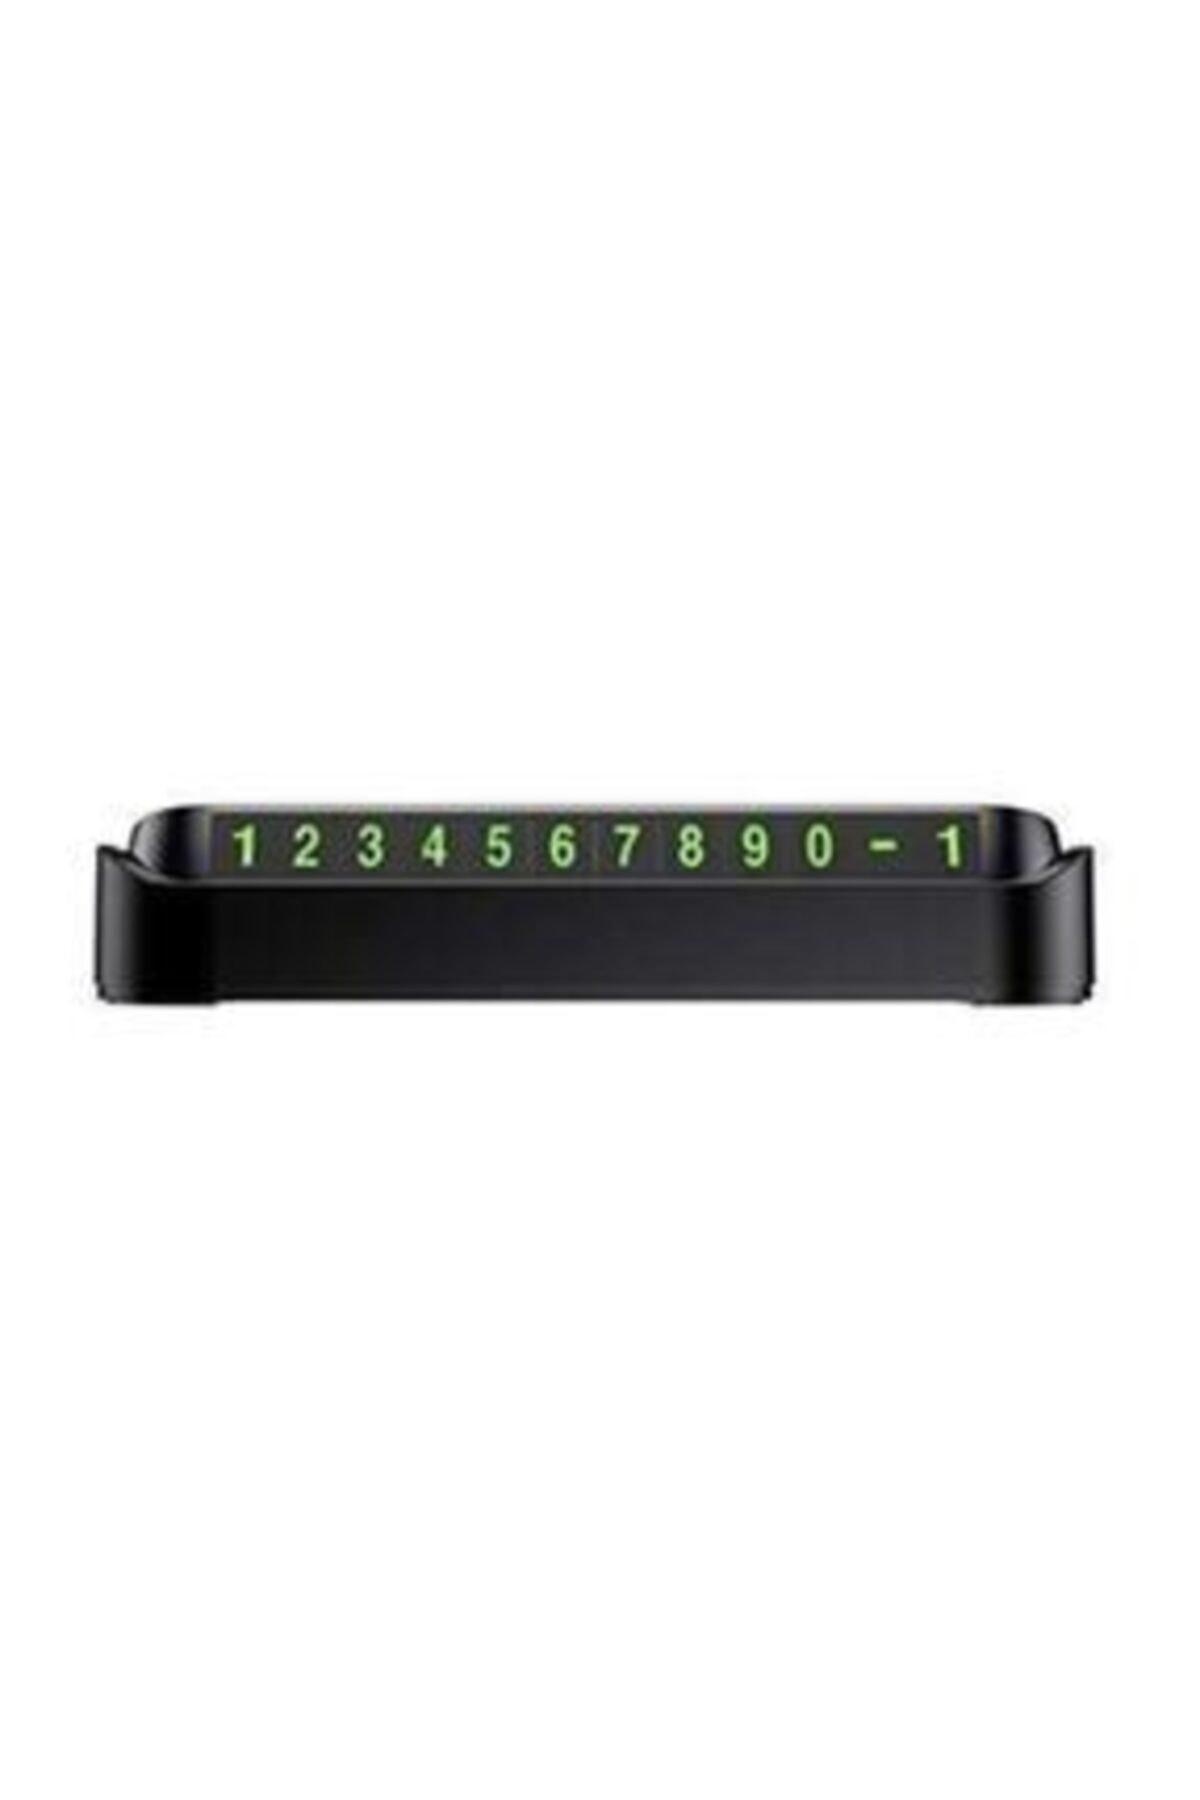 KDMAKSESUAR Aç Kapa Sistem Araç Park Telefon Numaratörü 1